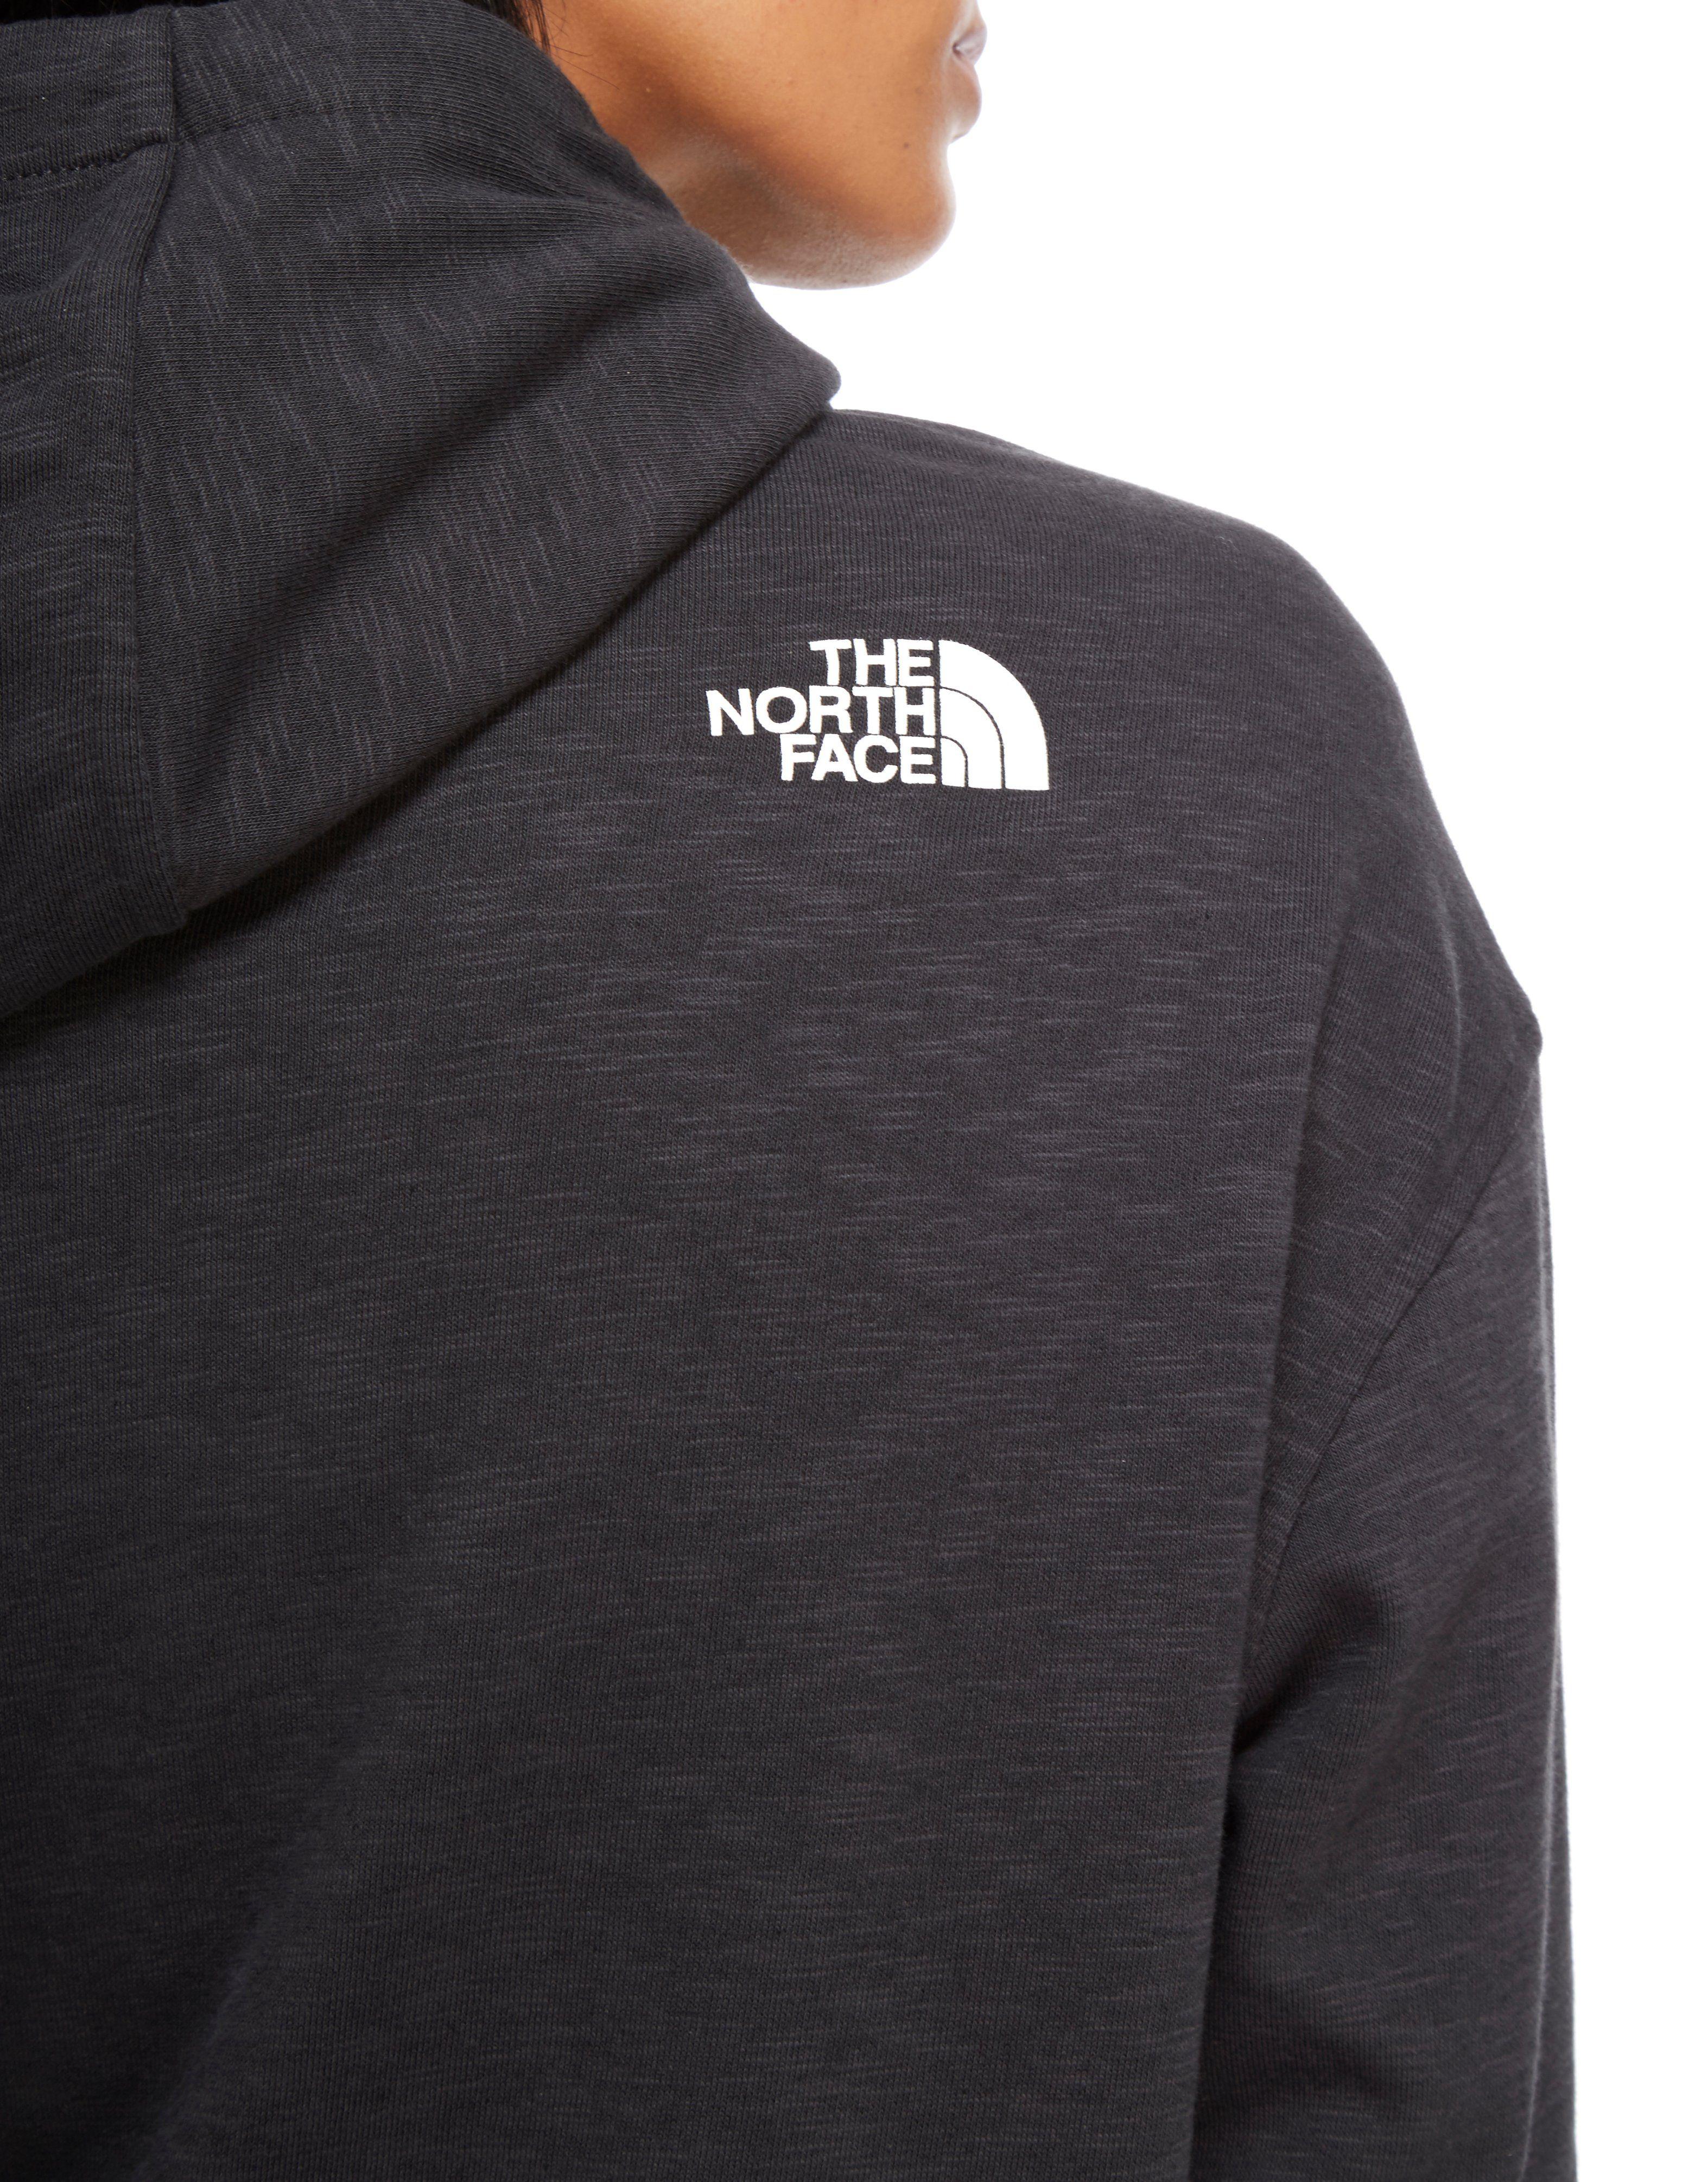 The North Face chaqueta con capucha Space Dye